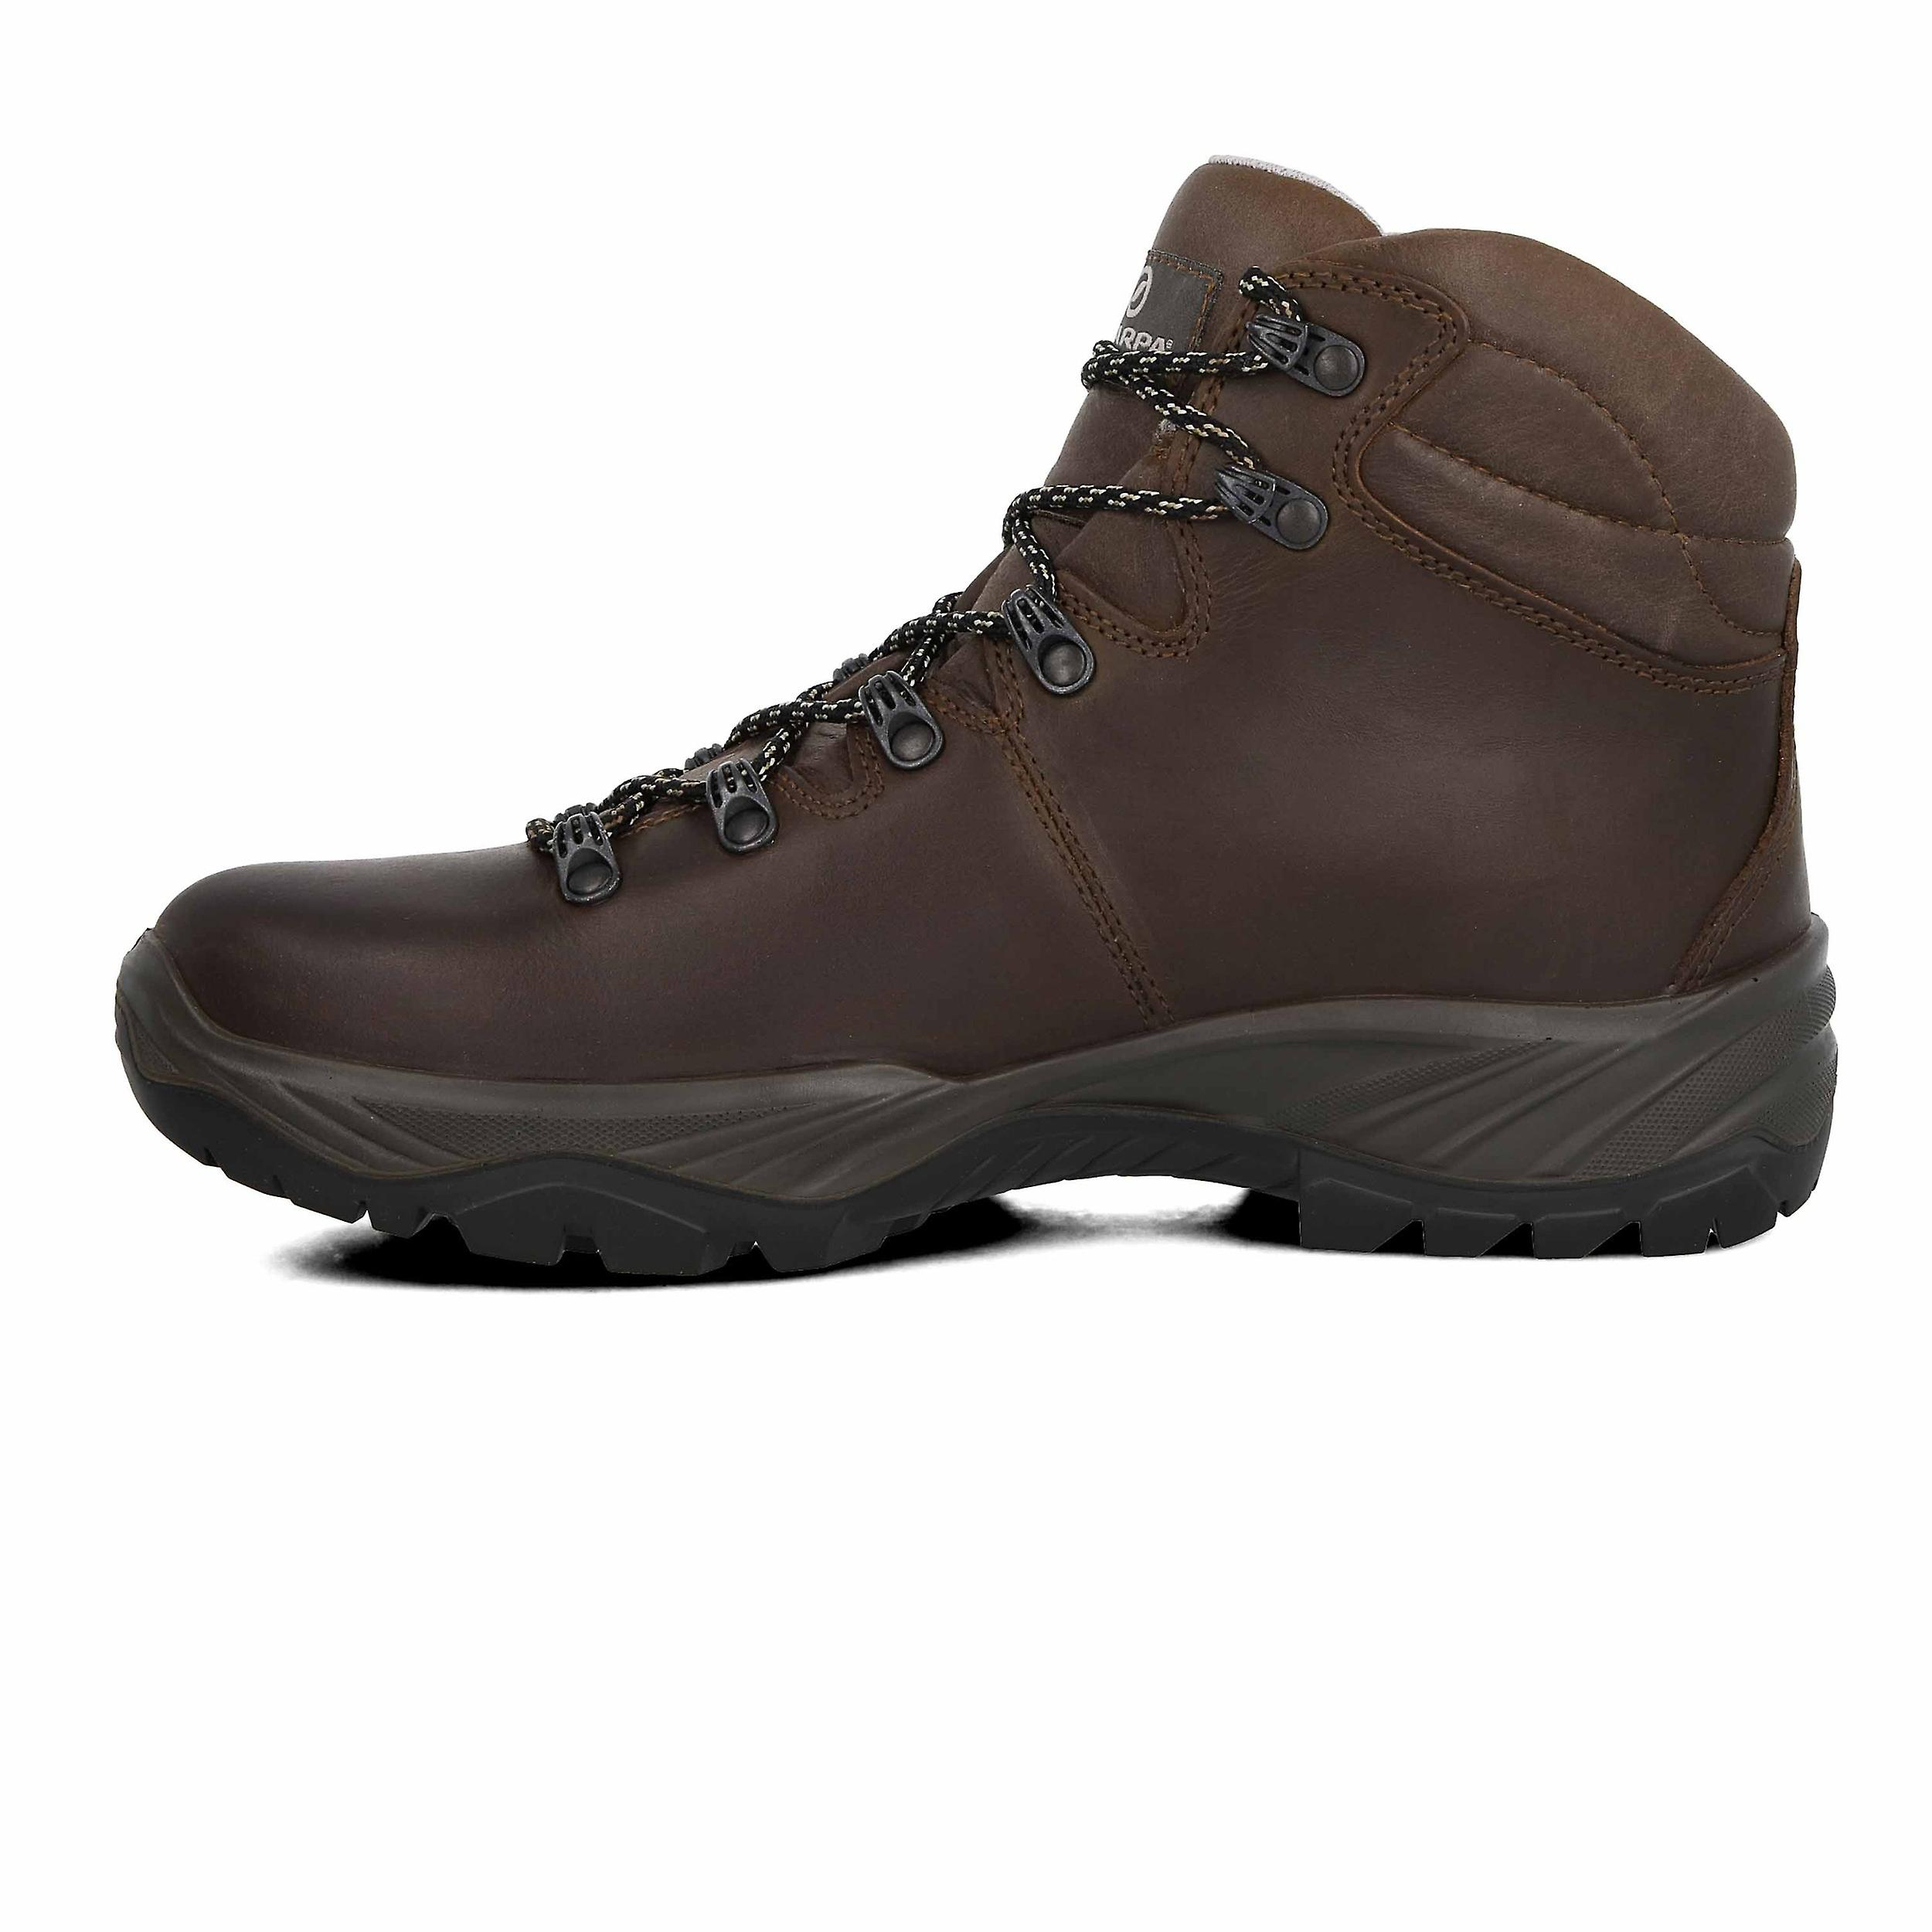 Scarpa Terra GORE-TEX Women's Walking Boots - AW20 bQ33c